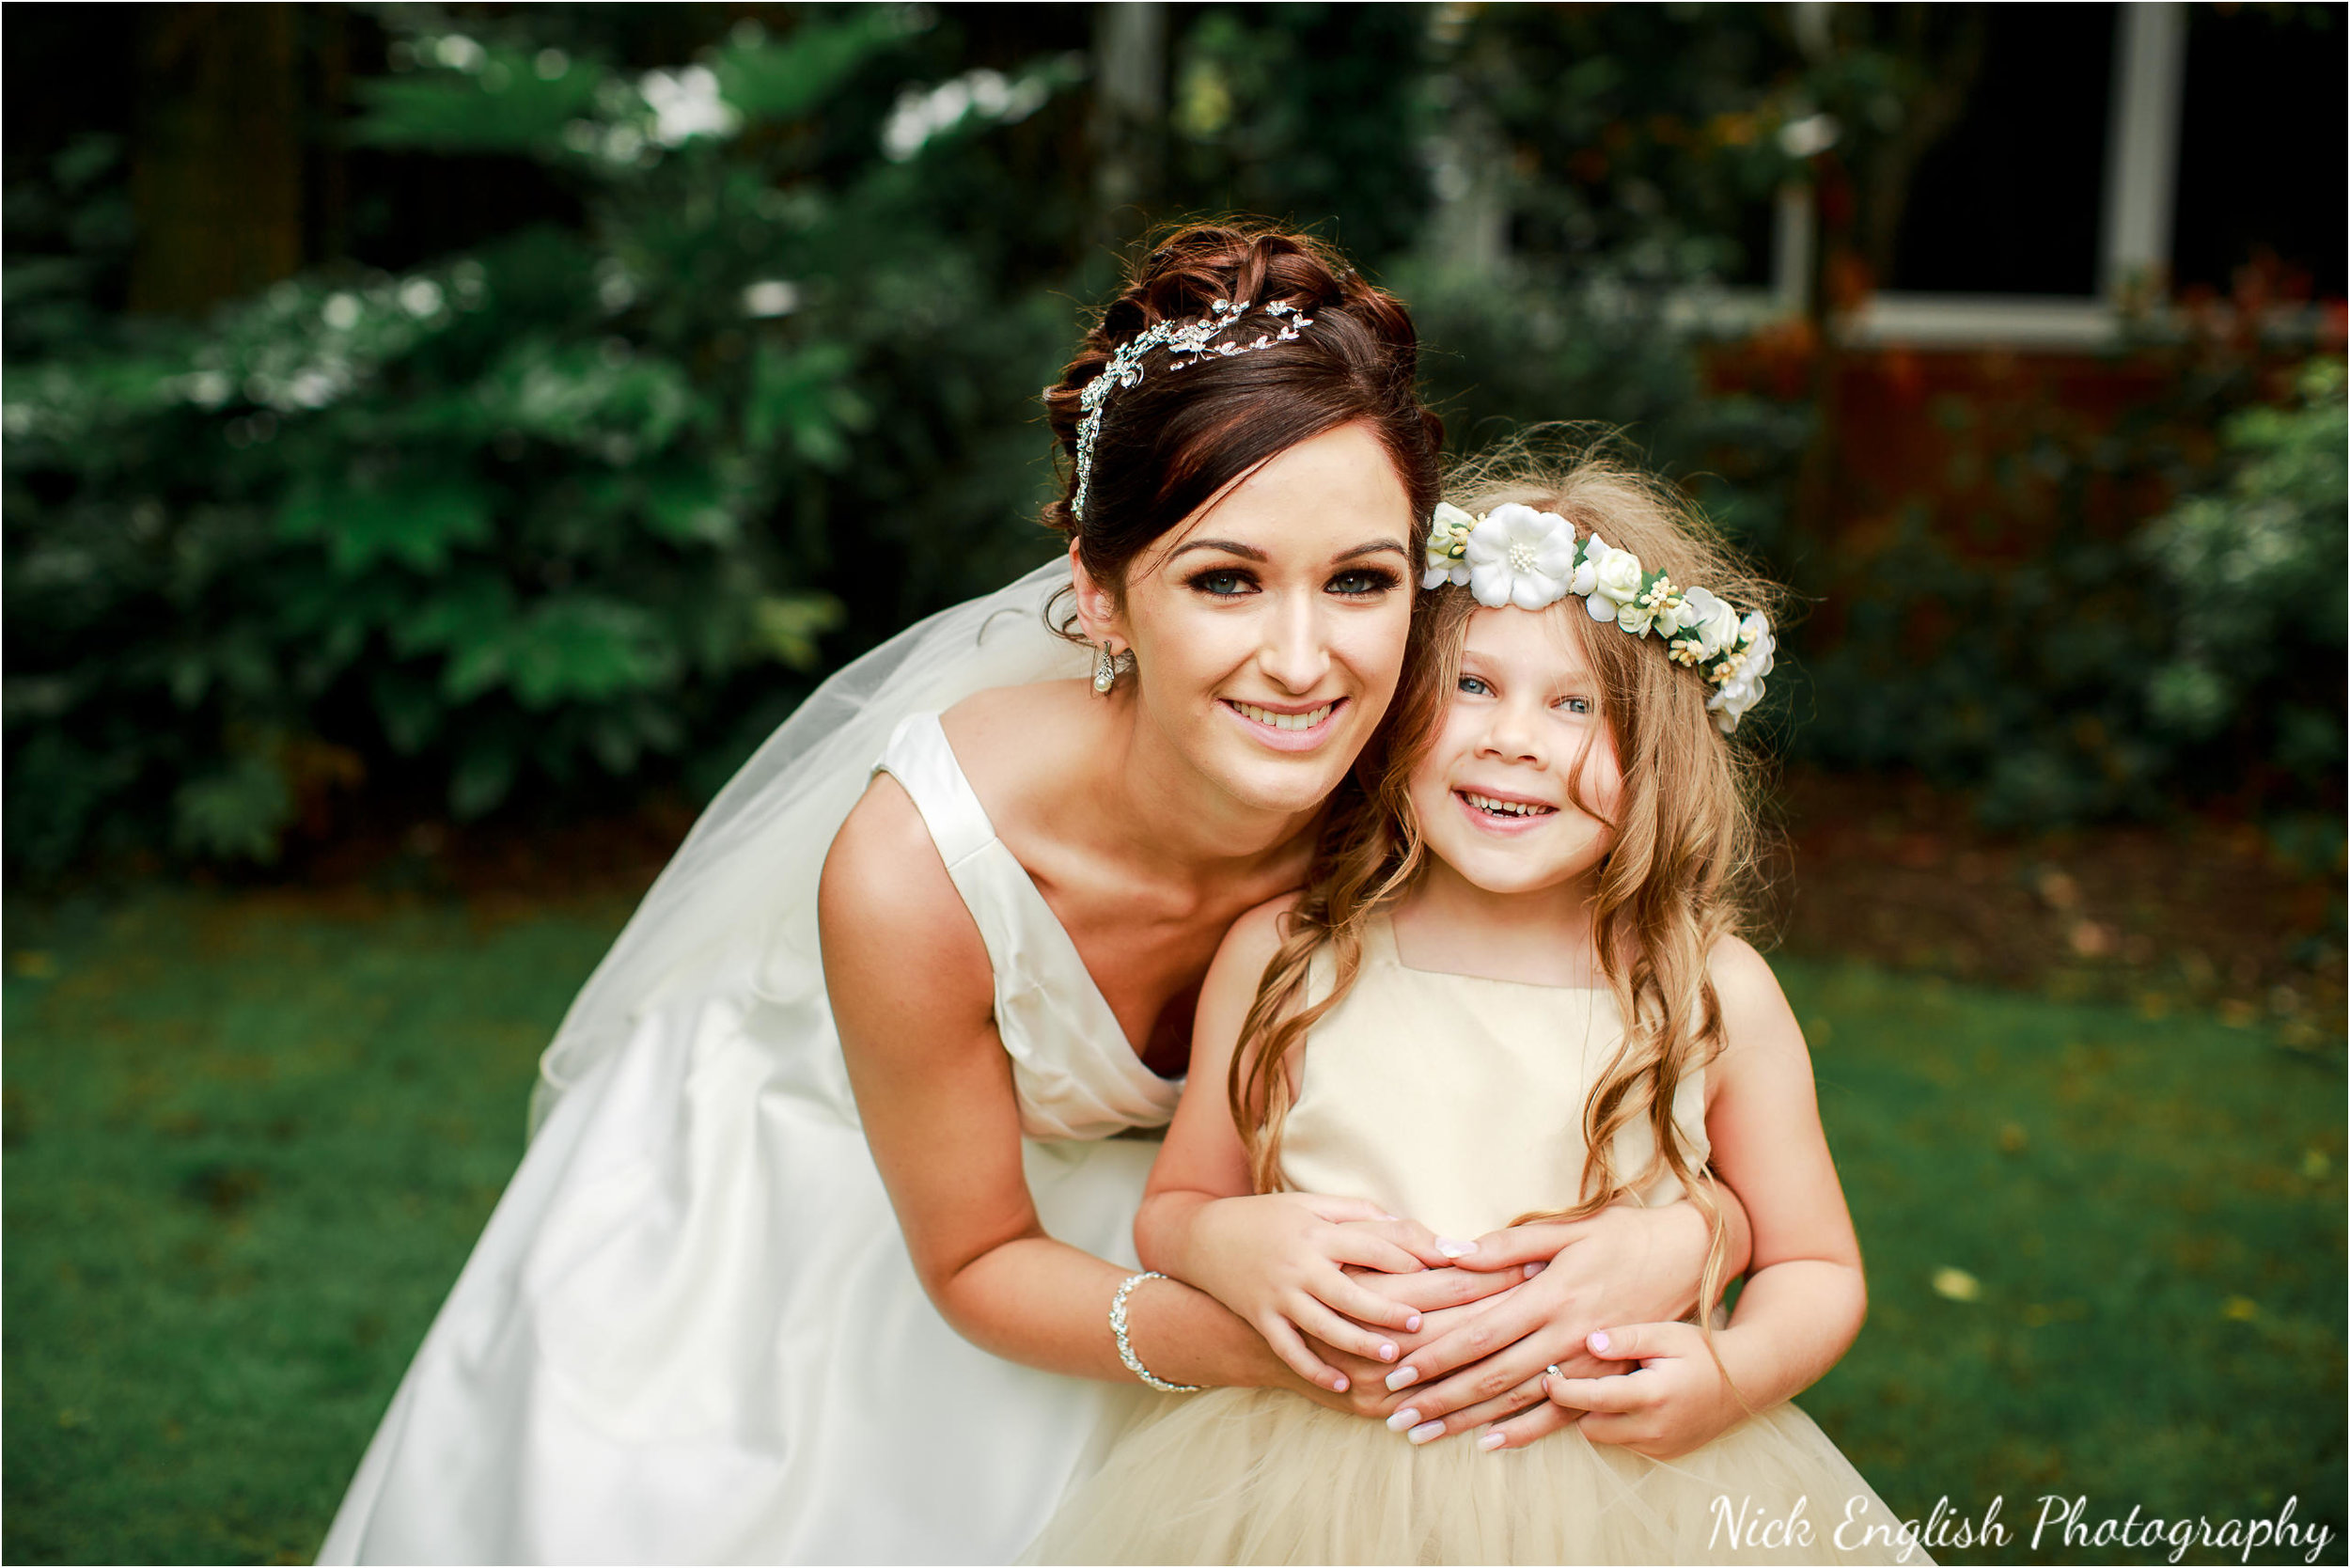 Emily David Wedding Photographs at Barton Grange Preston by Nick English Photography 135jpg.jpeg